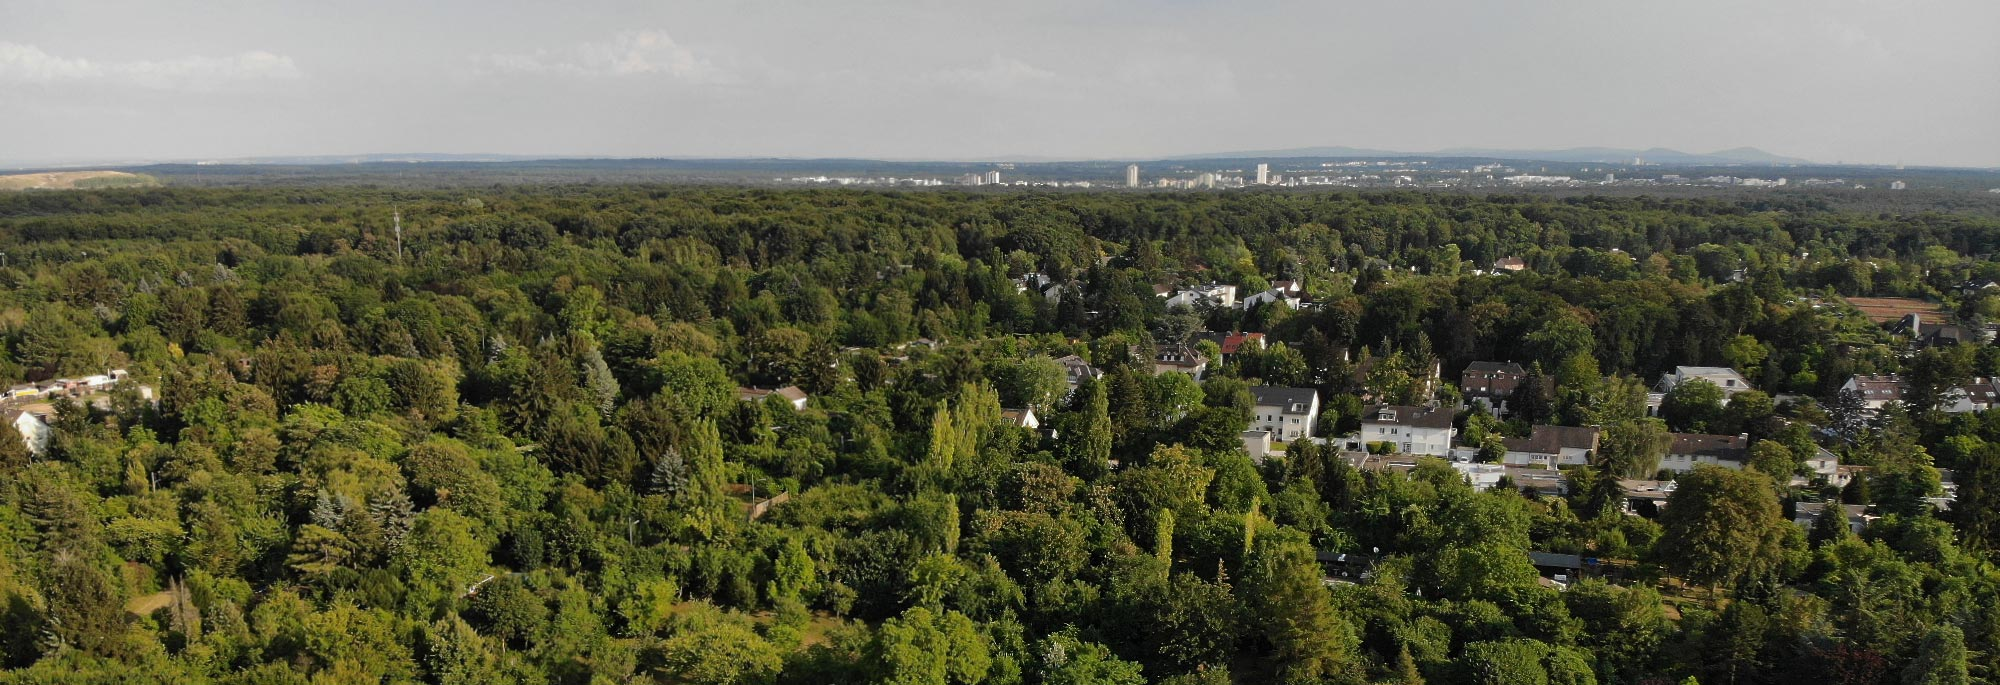 Grüngürtel Frankfurt am Main - Landschaftsschutzgebiet Frankfurt - Natuschutzgebiet - Frankfurt Stadtwald - Frankfurter Grüngürtel und Immobilien